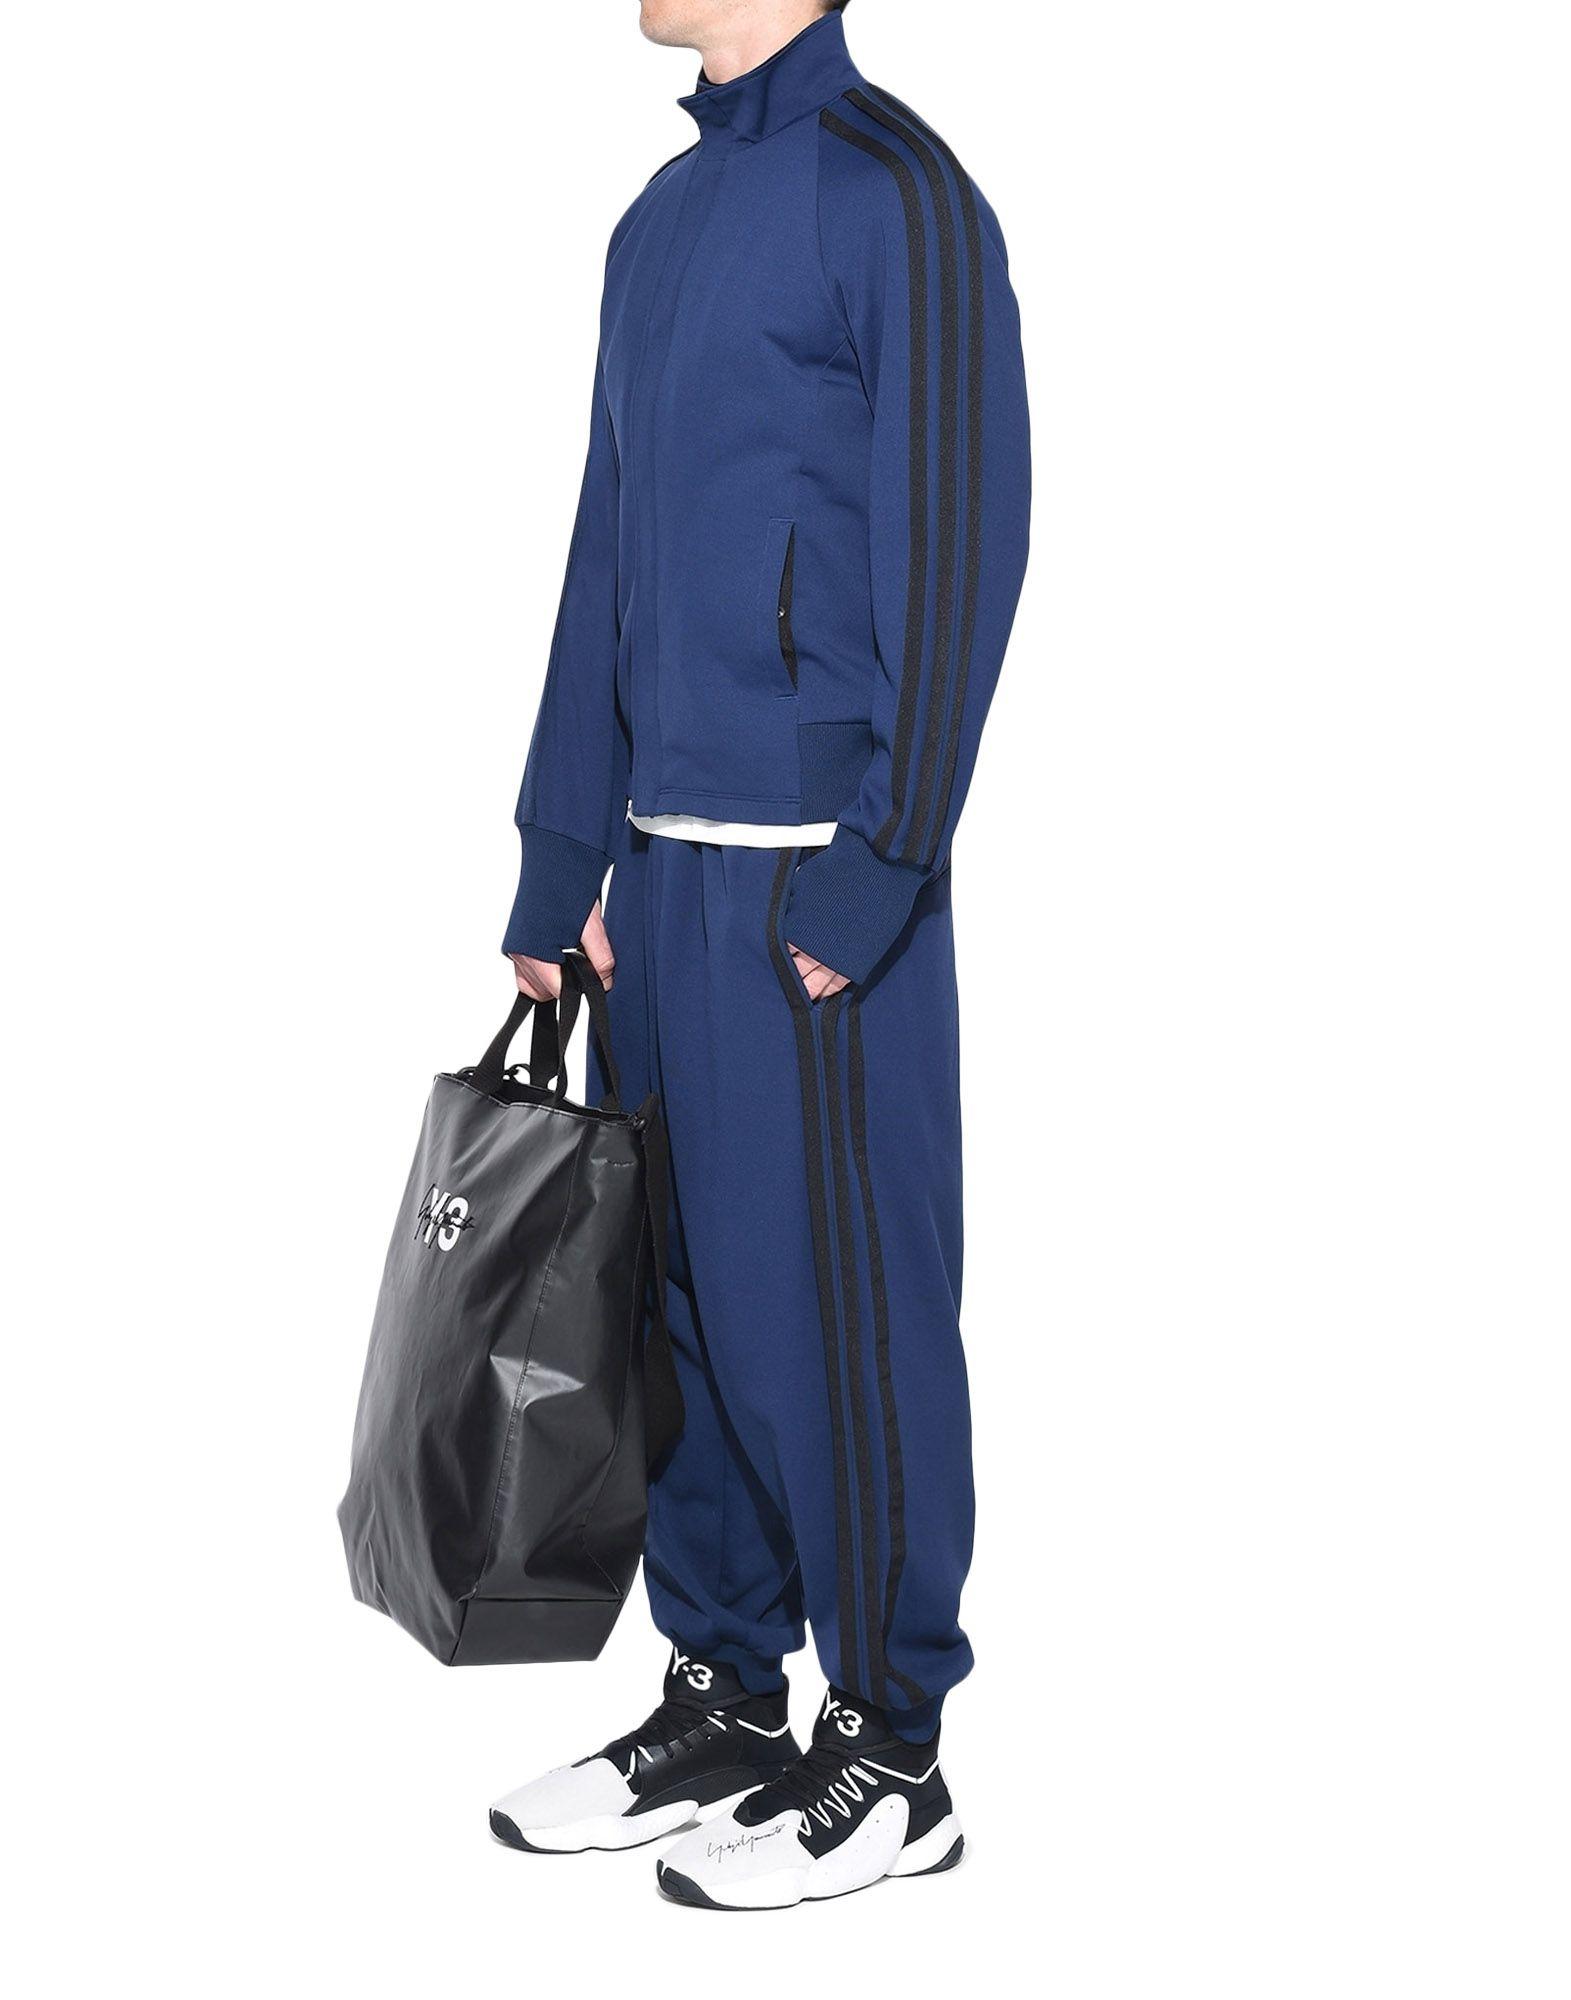 Y-3 Y-3 3-Stripes Selvedge Matte Track Pants Track pant Herren a